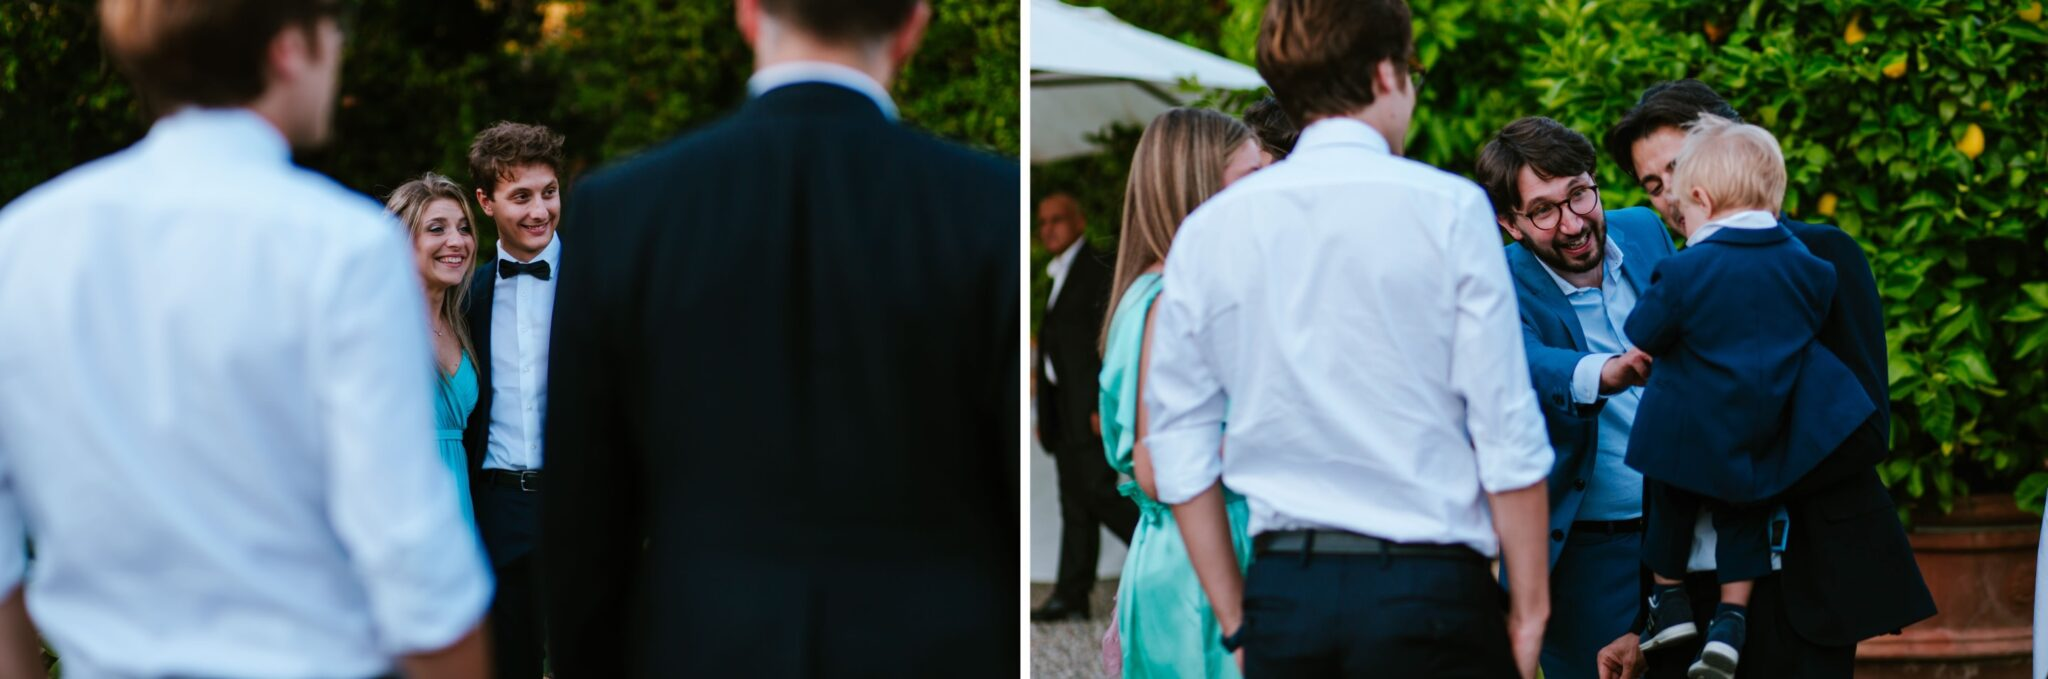 reportage matrimonio a Villa Grabau